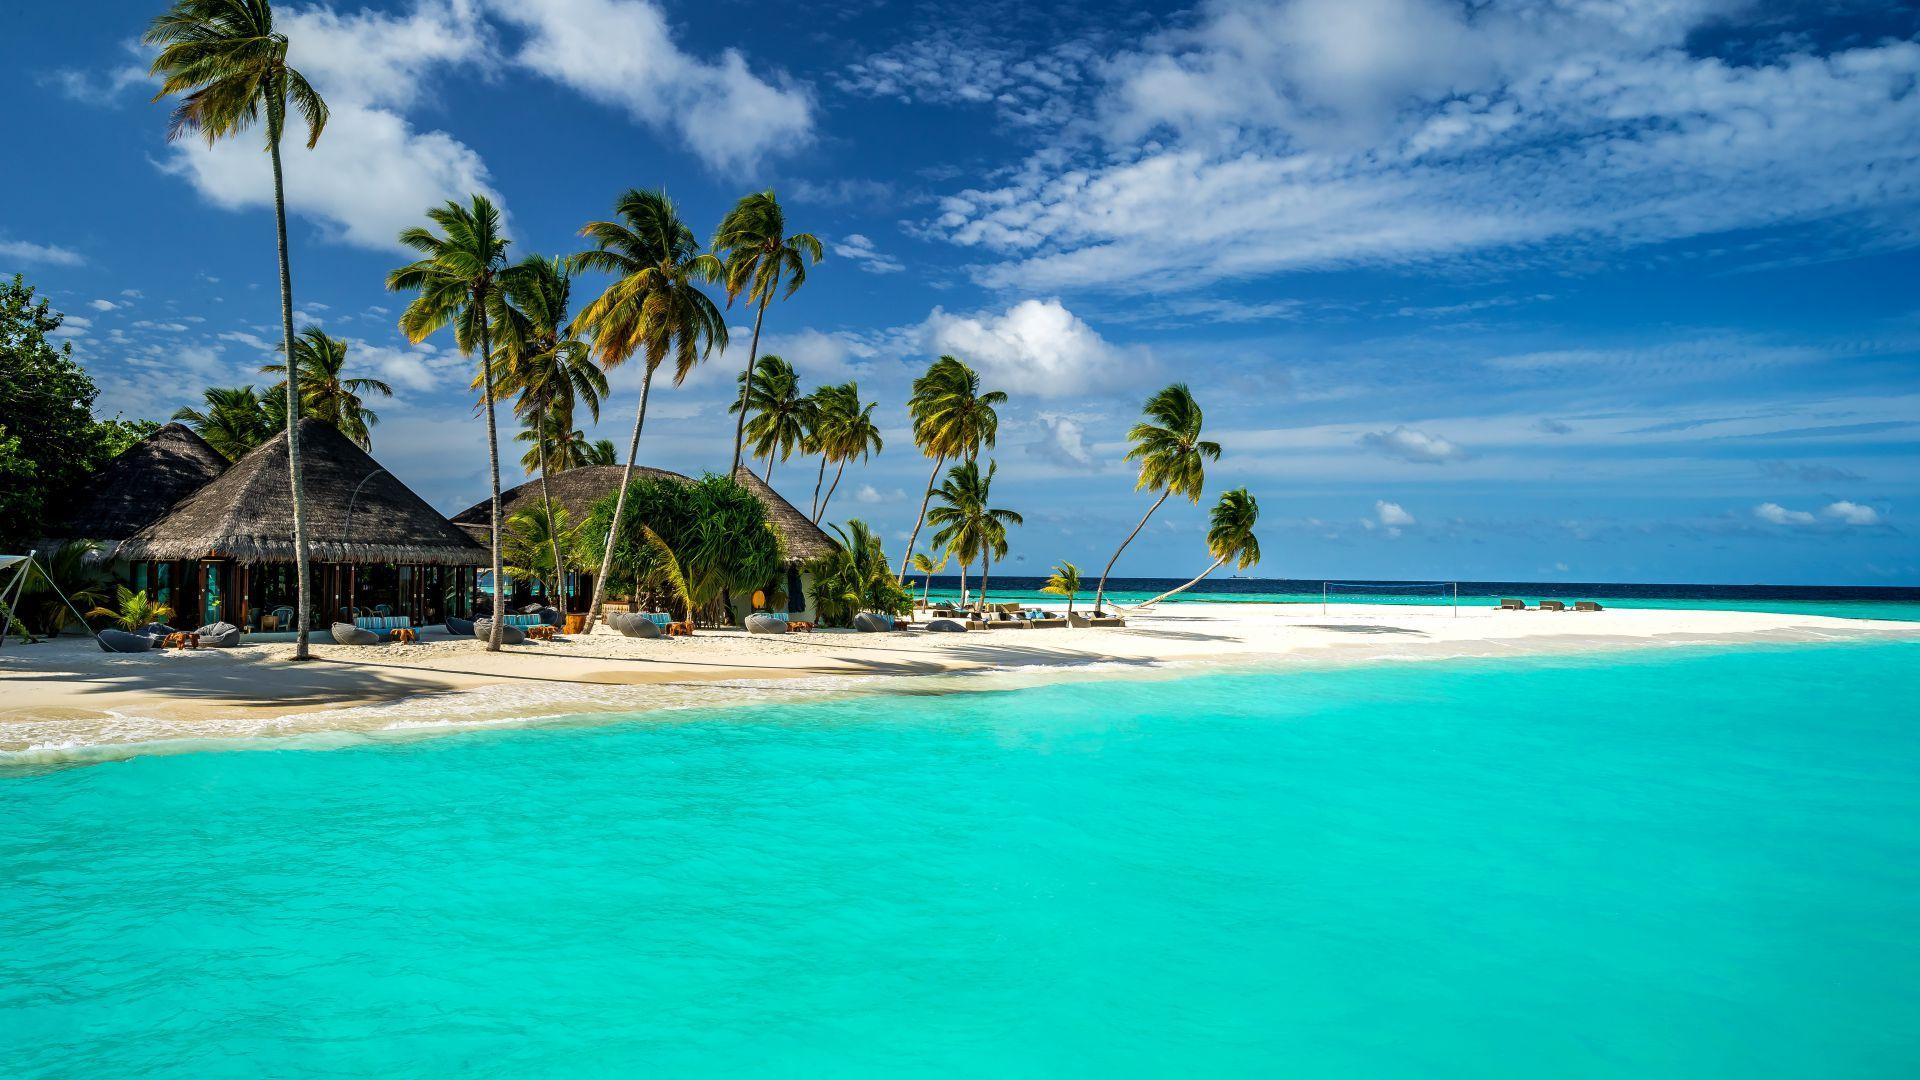 Maldives 5k 4k Wallpaper 8k Indian Ocean Best Beaches In The